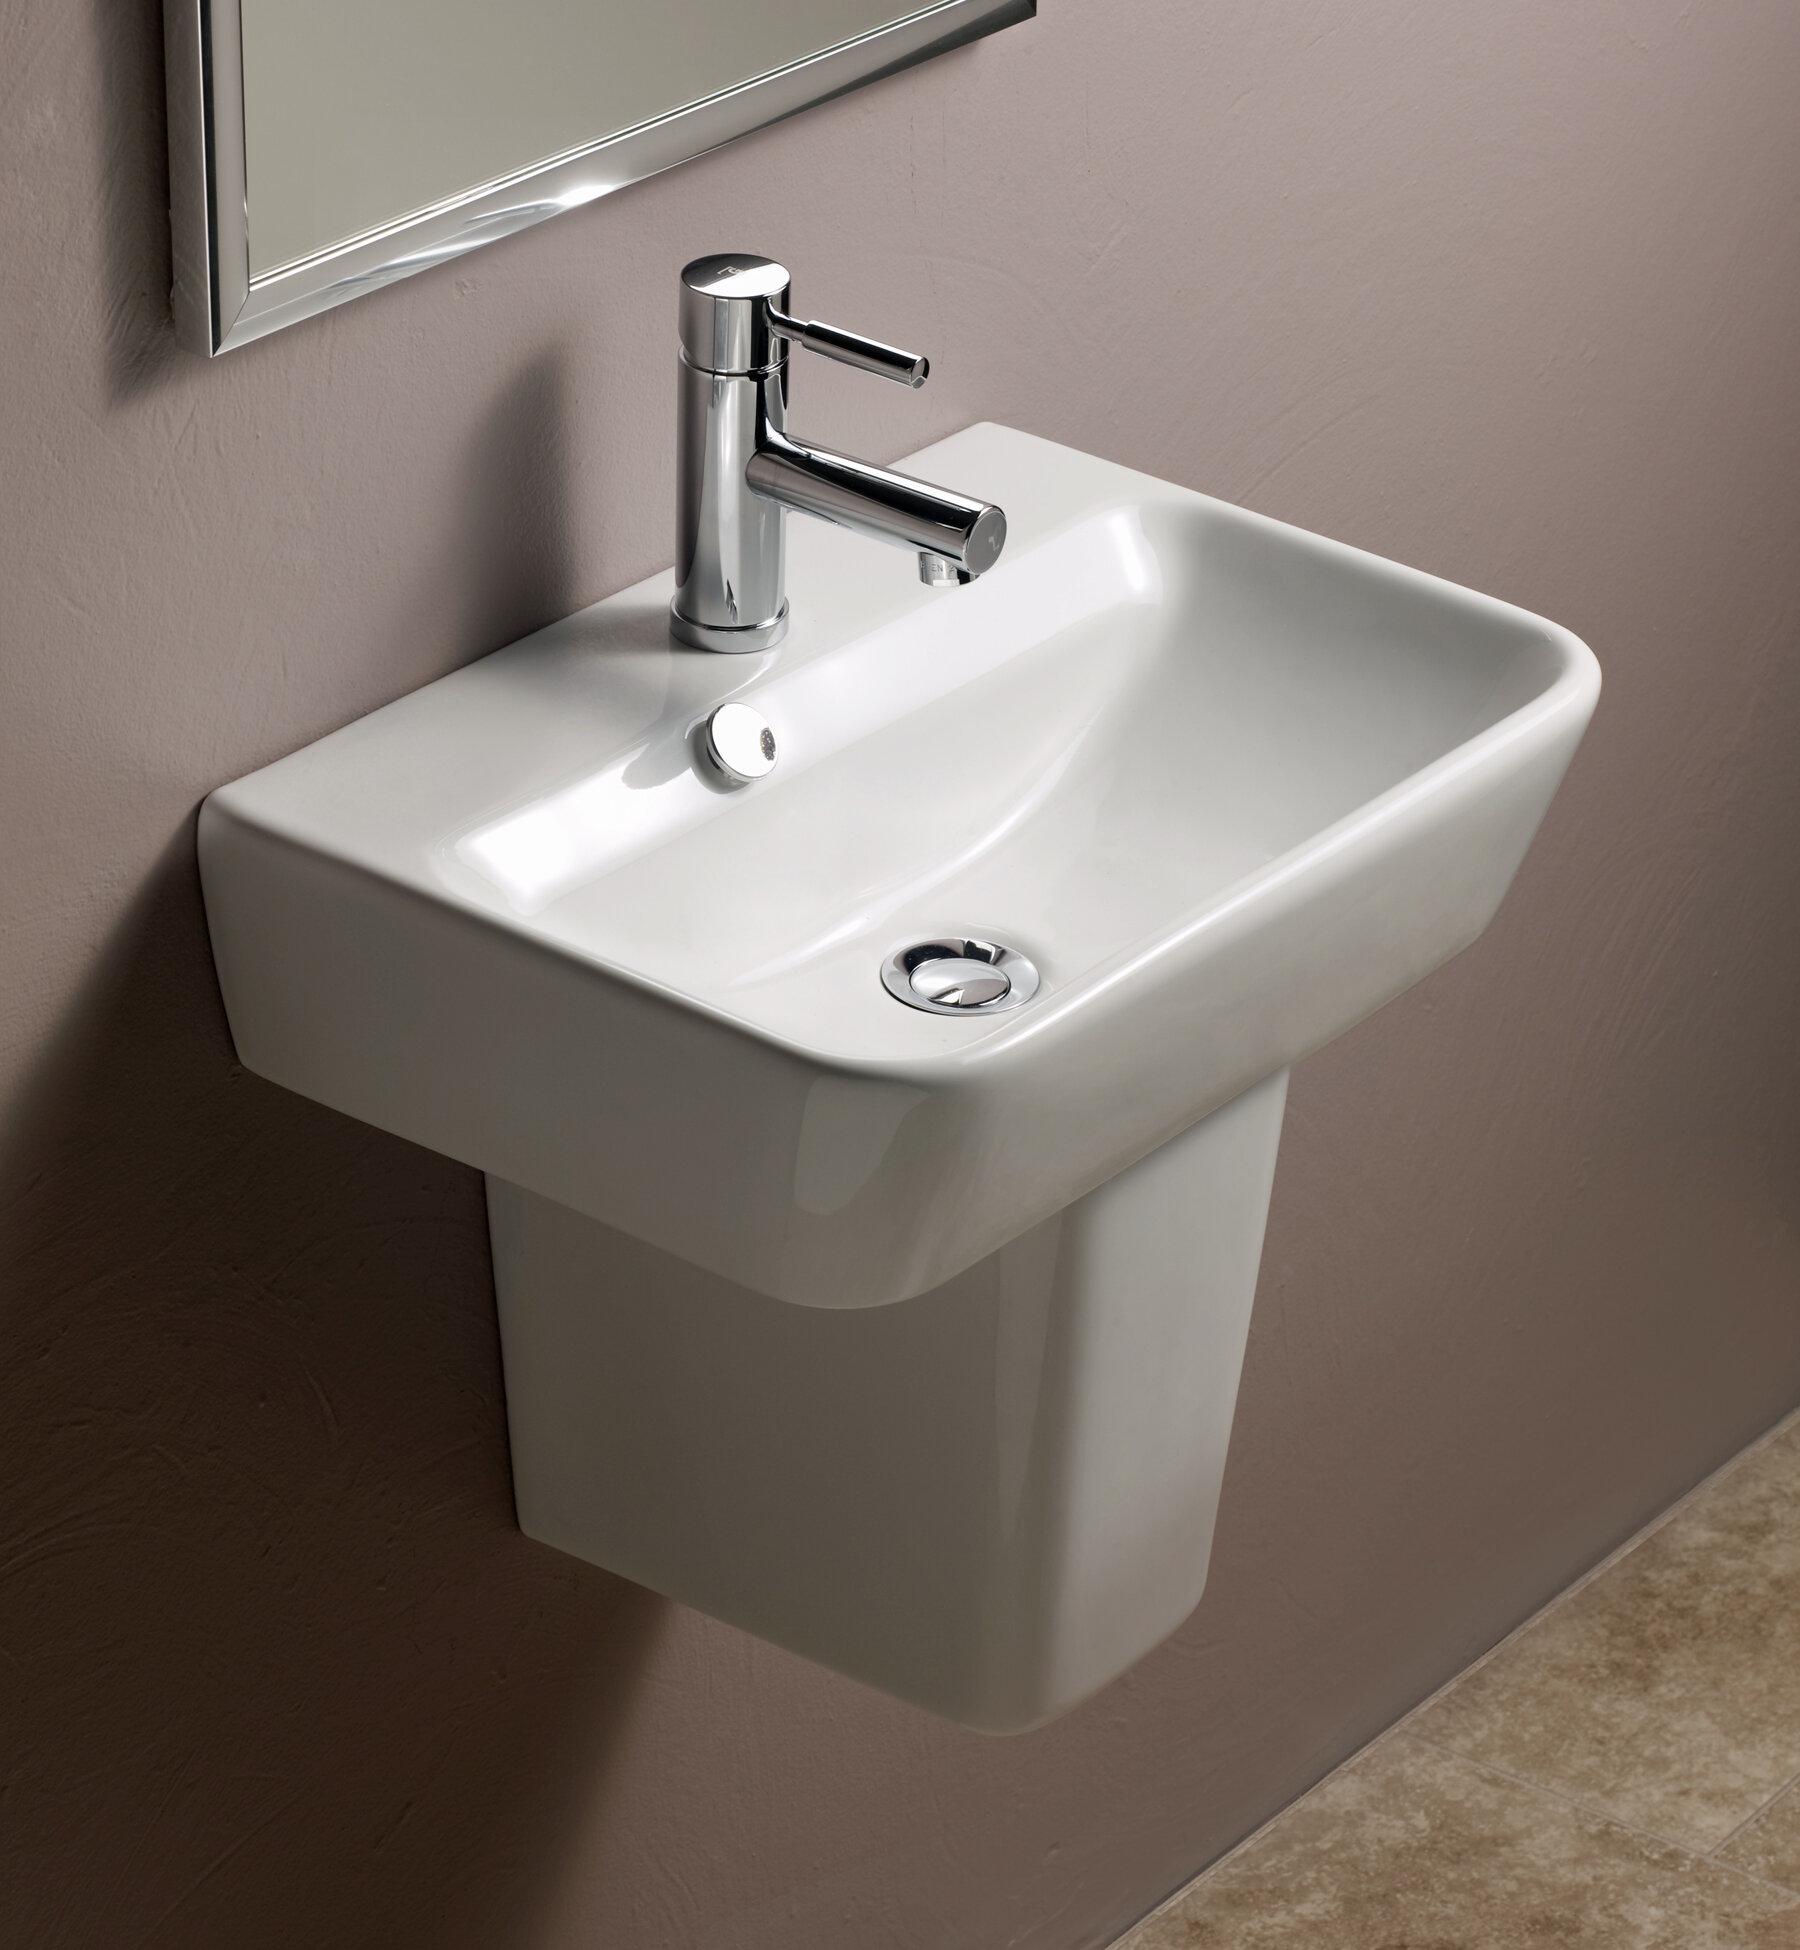 Zipcode Design Doraville Vitreous China 20 Semi Pedestal Bathroom Sink With Overflow Wayfair